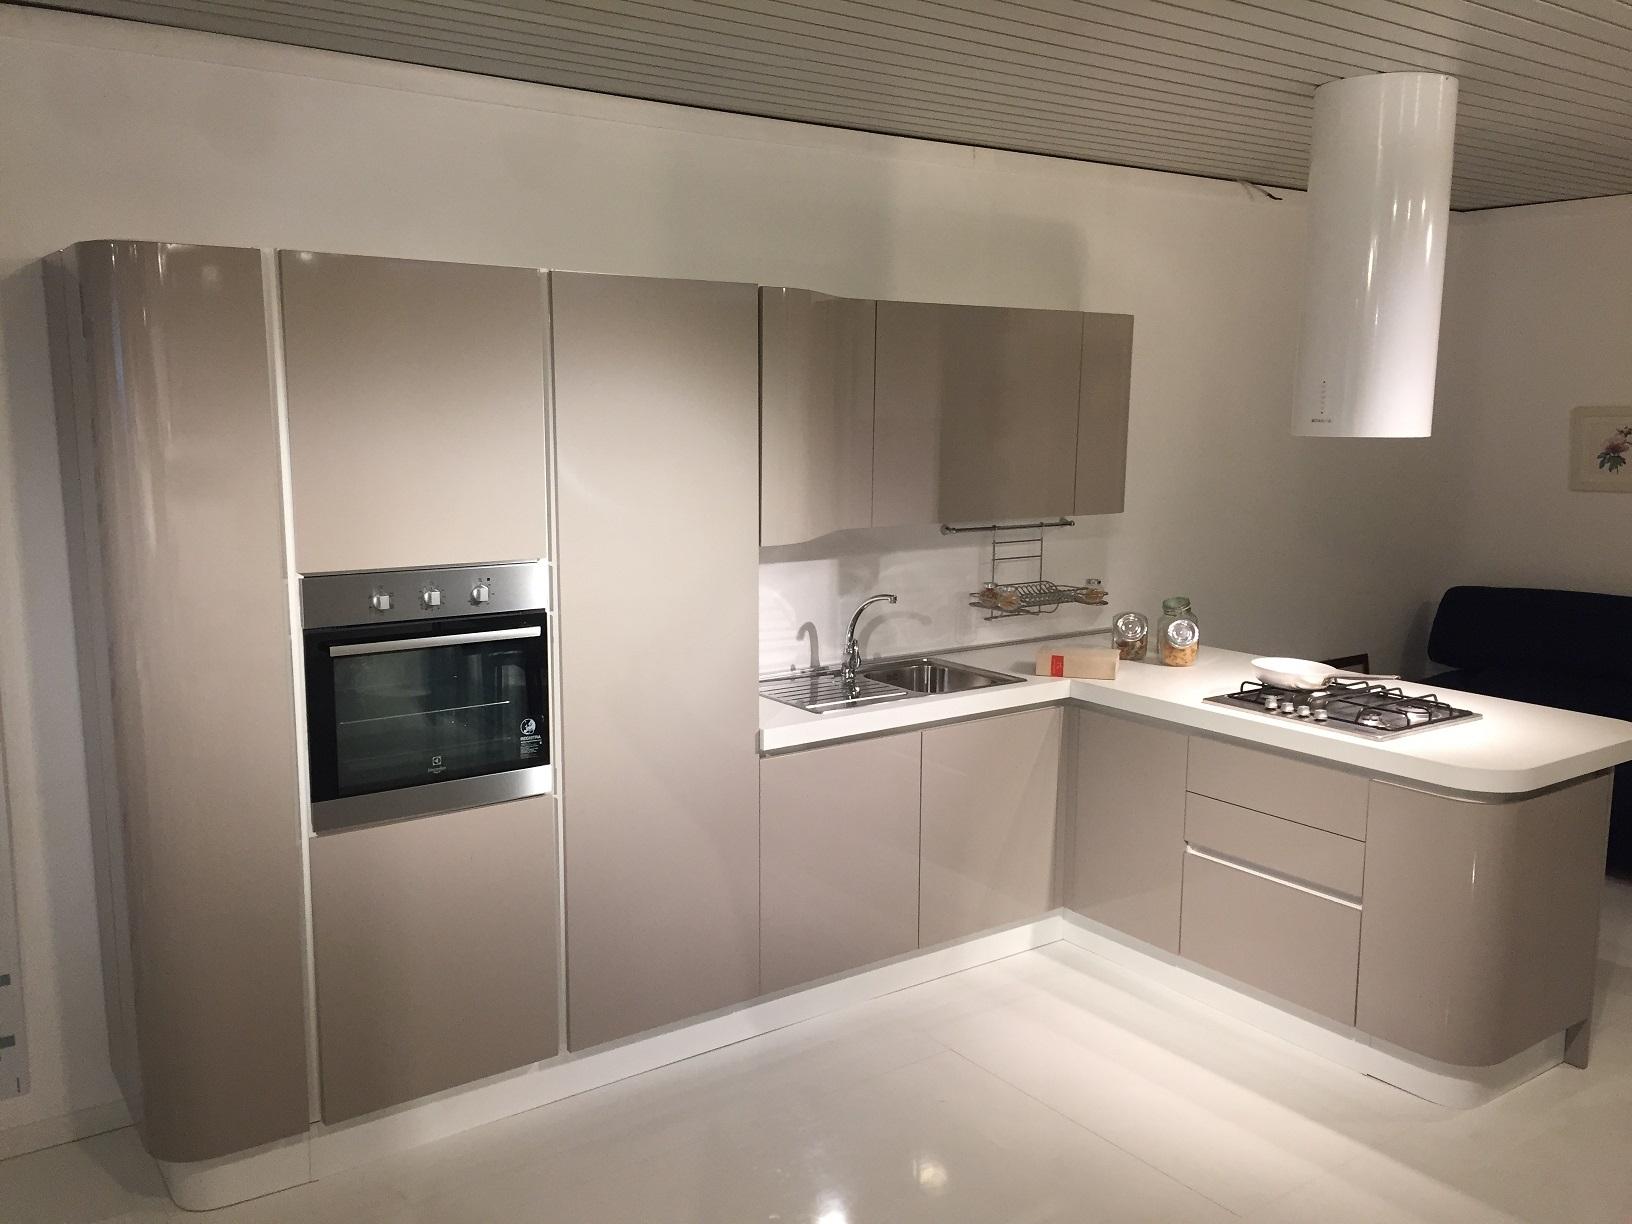 Aran cucine cucina penelope scontato del 50 cucine a for Cucine immagini